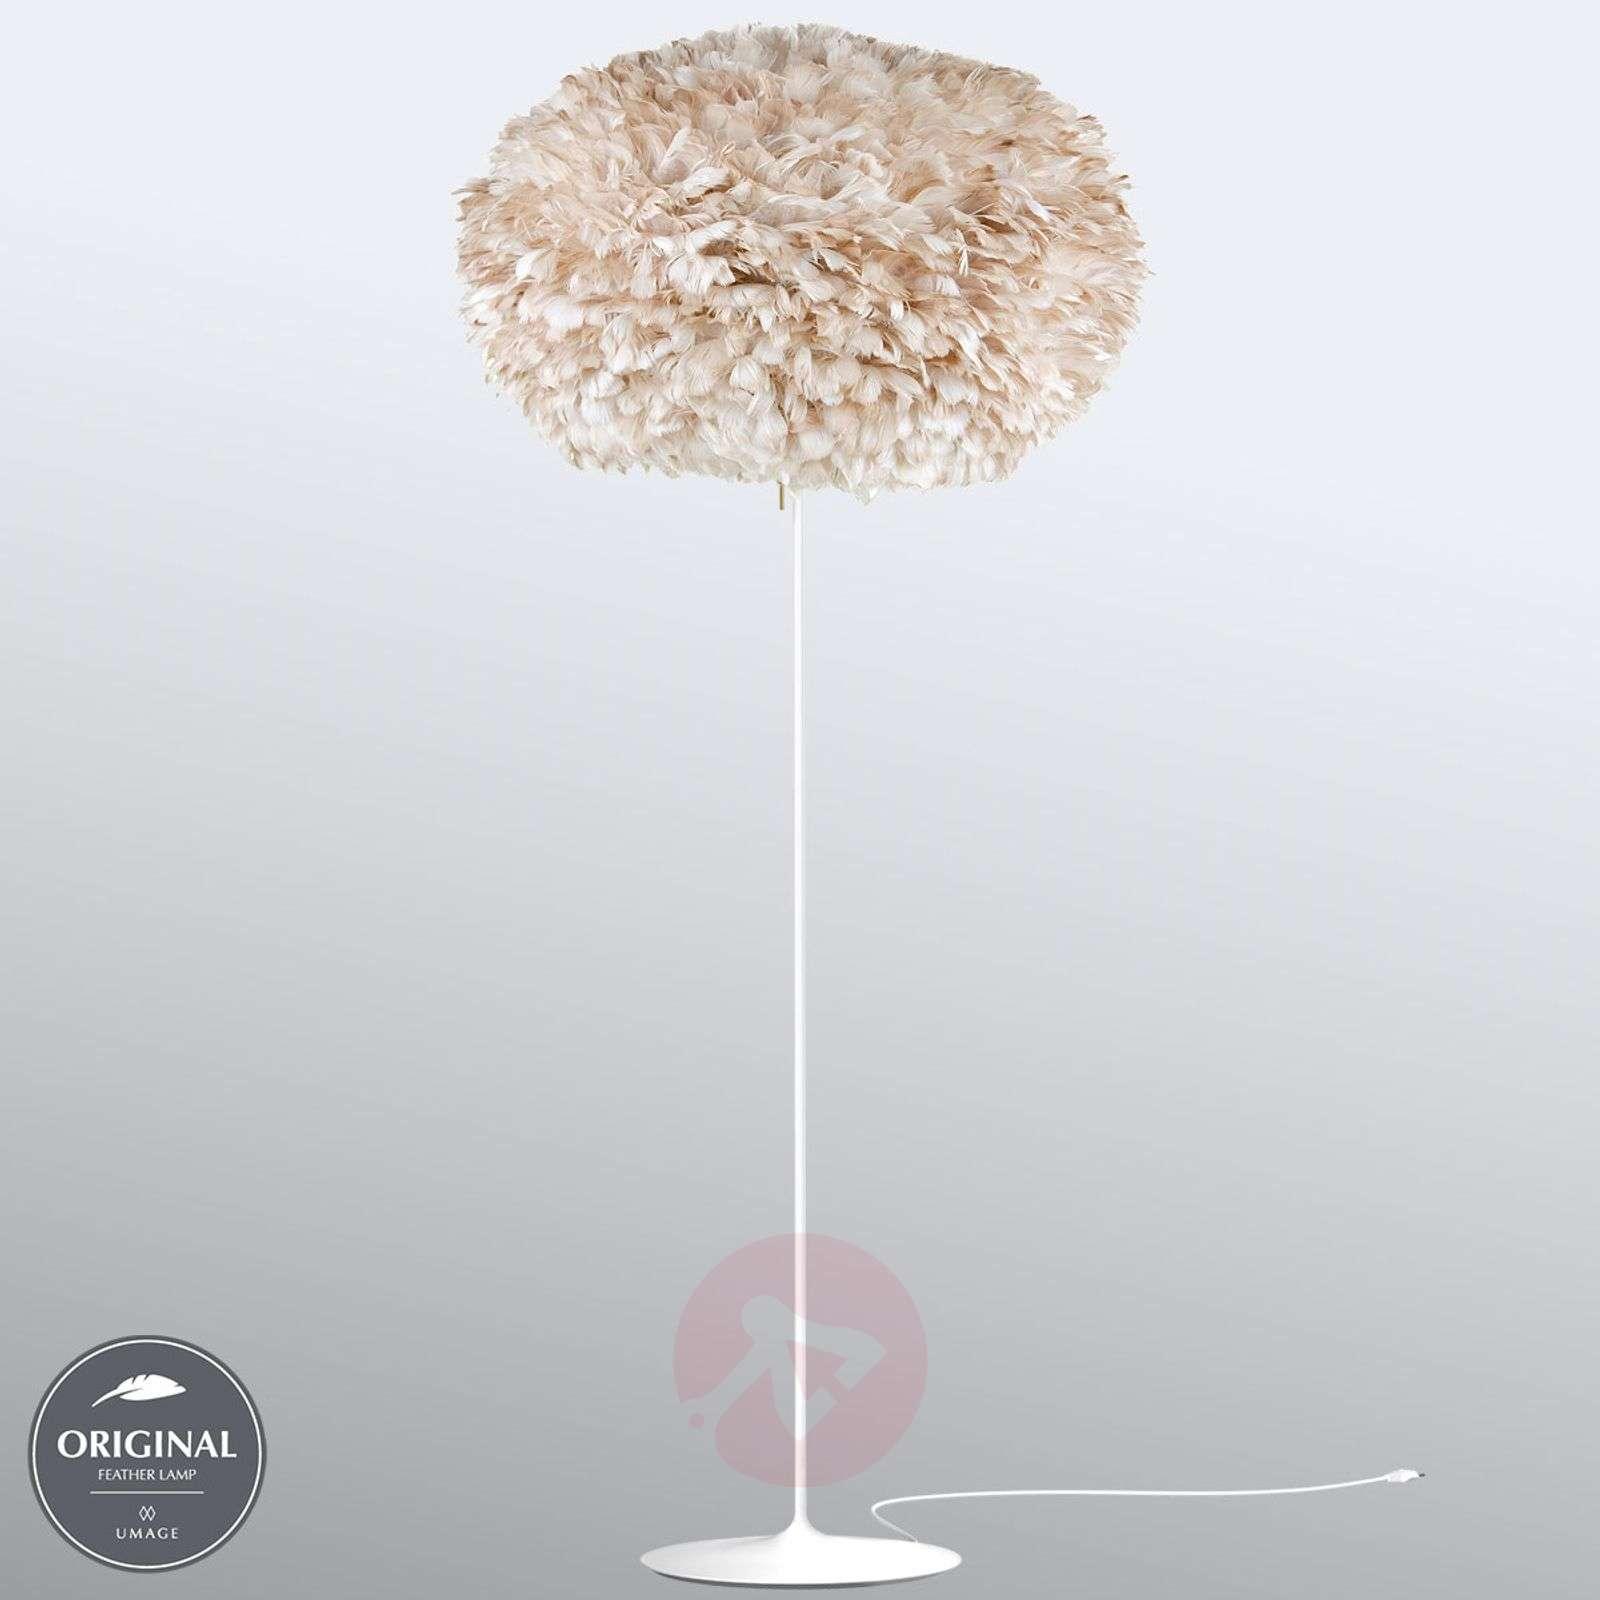 UMAGE Eos X-large floor lamp, light brown-9521123-01